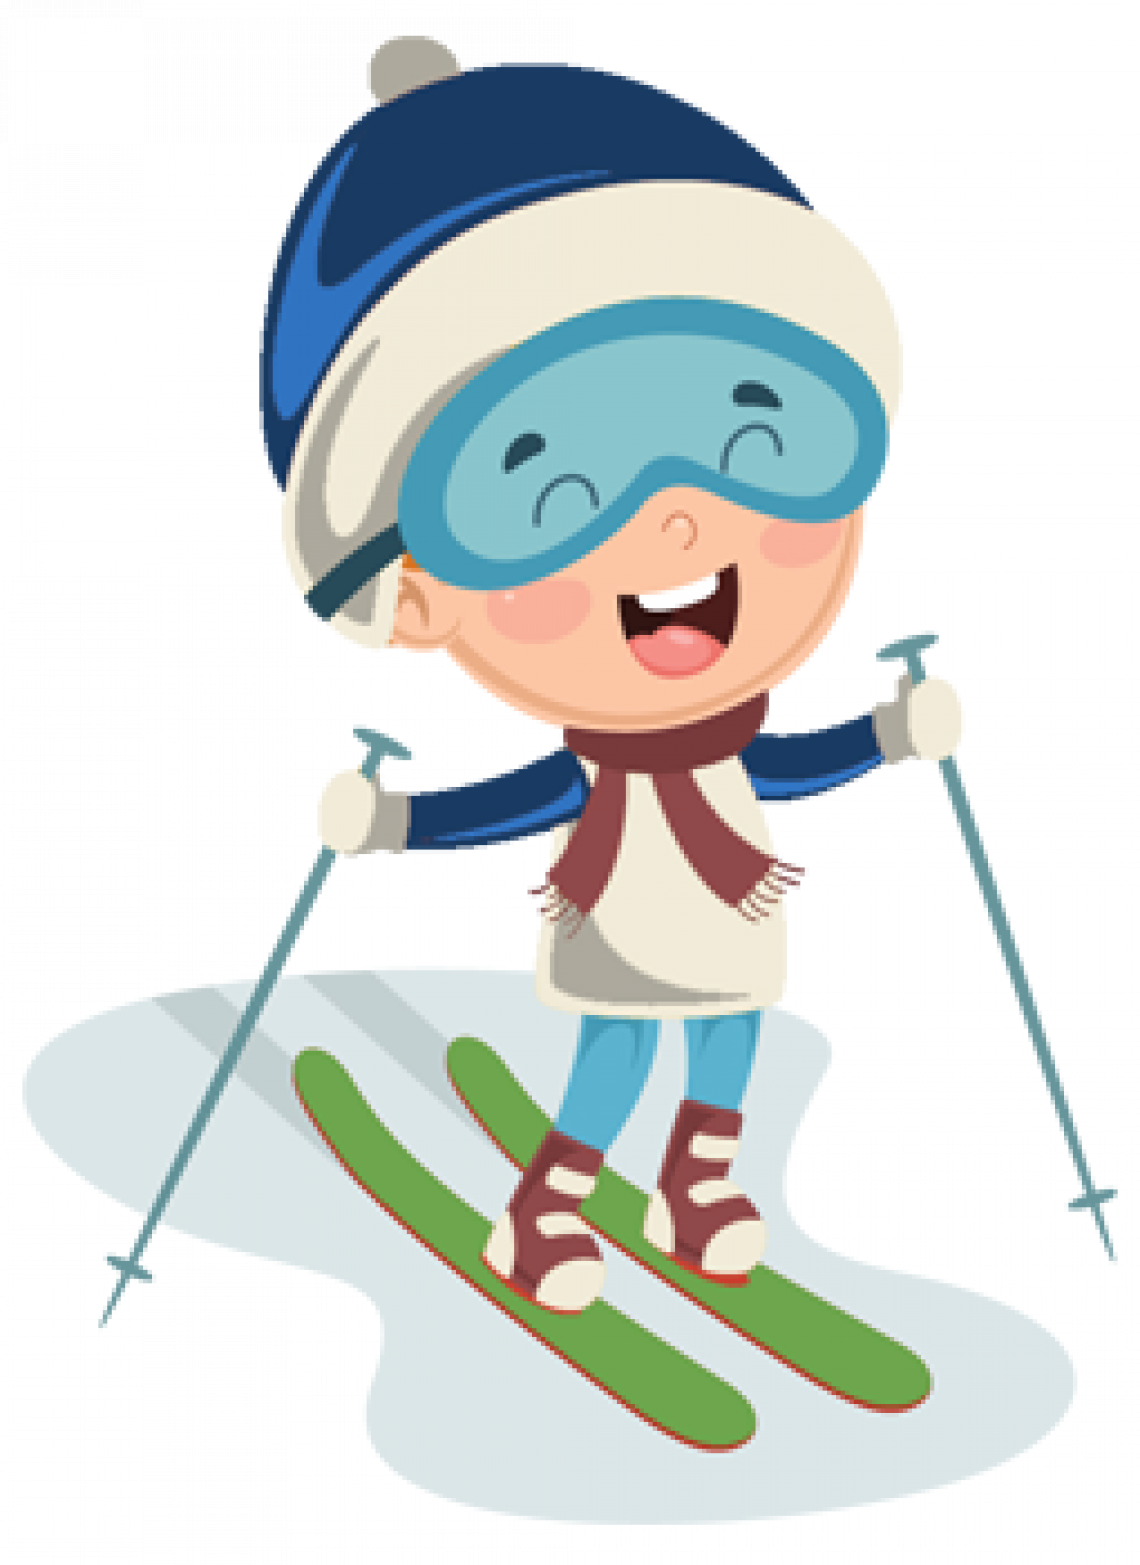 bestilling, rabatter, liftkort, skiskole, skileje